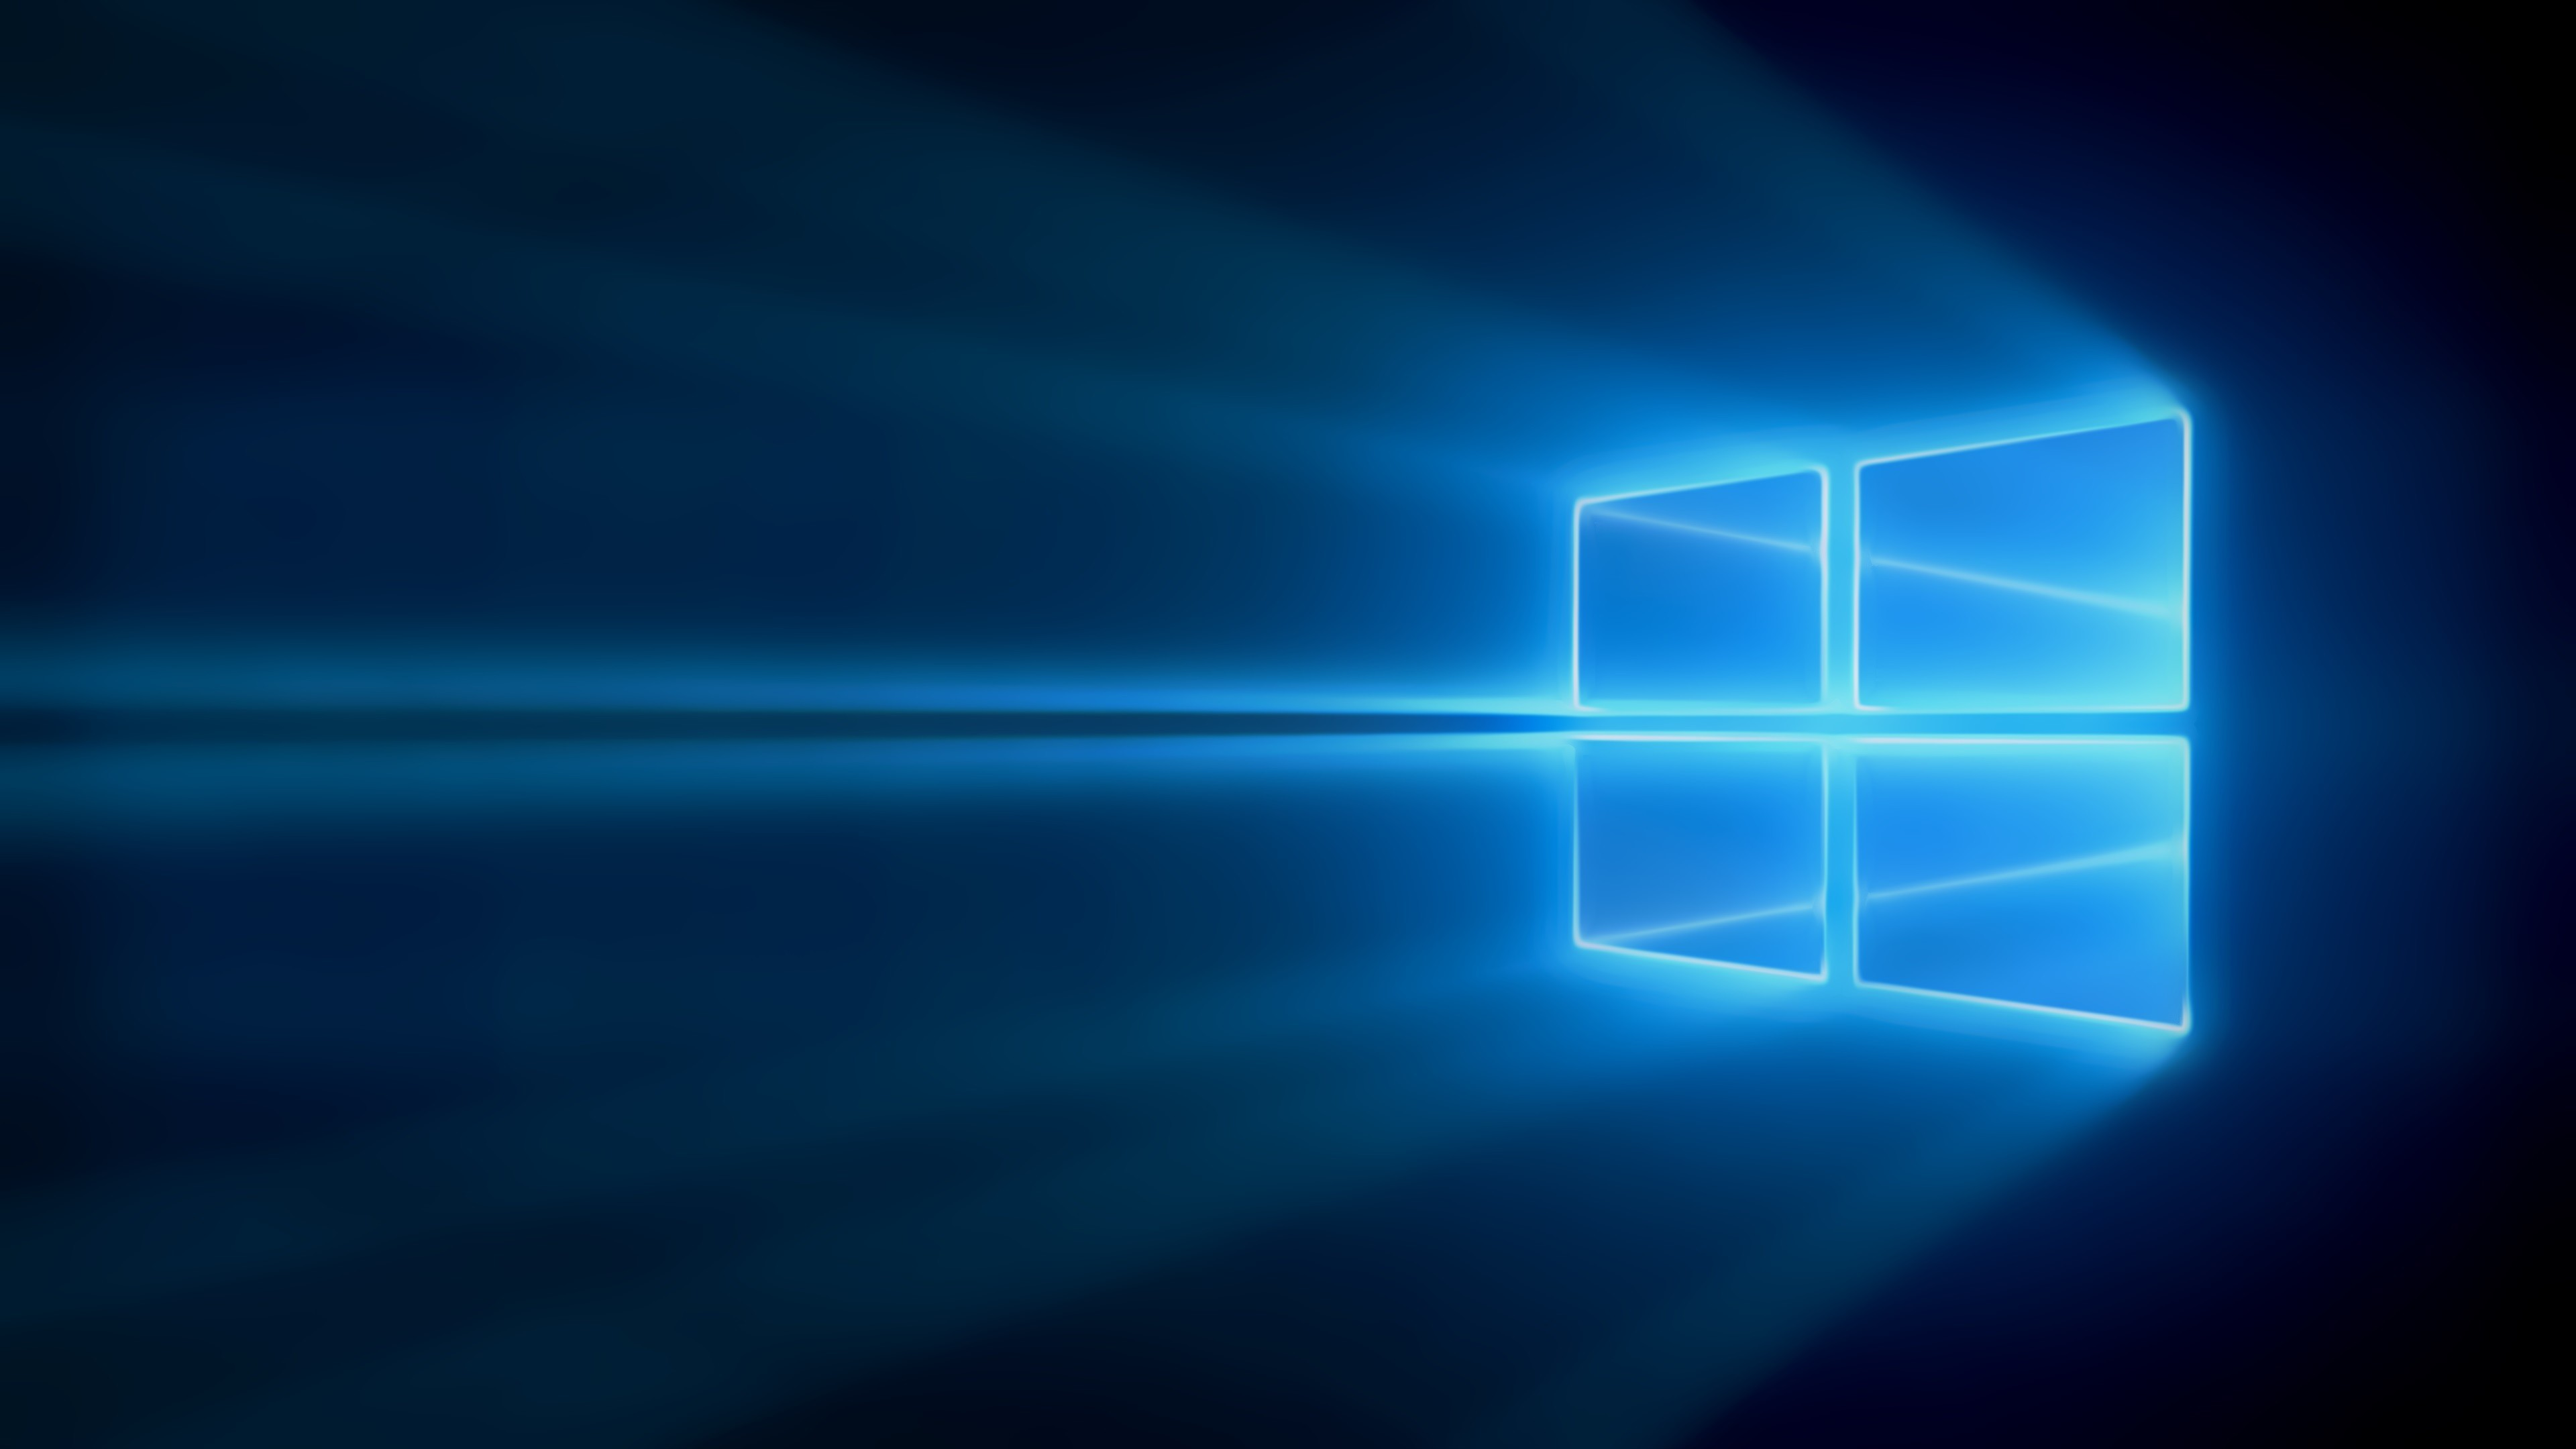 Black Wallpaper Windows 10 61 Images